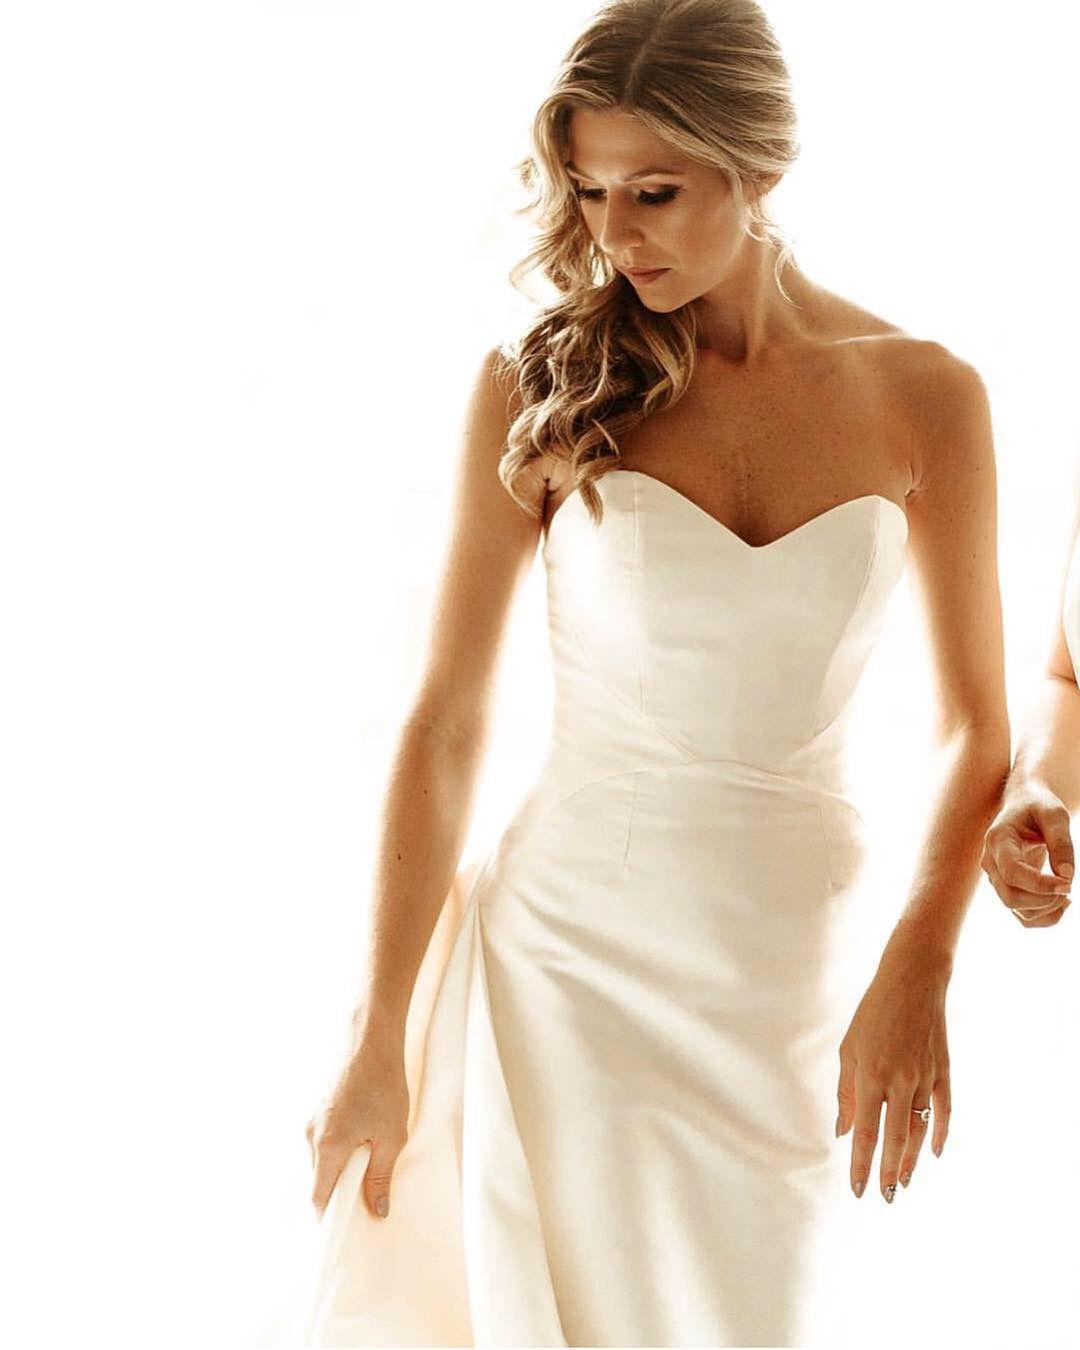 Annebargebride Niki In Radziwill Wedding Dress Side Swept